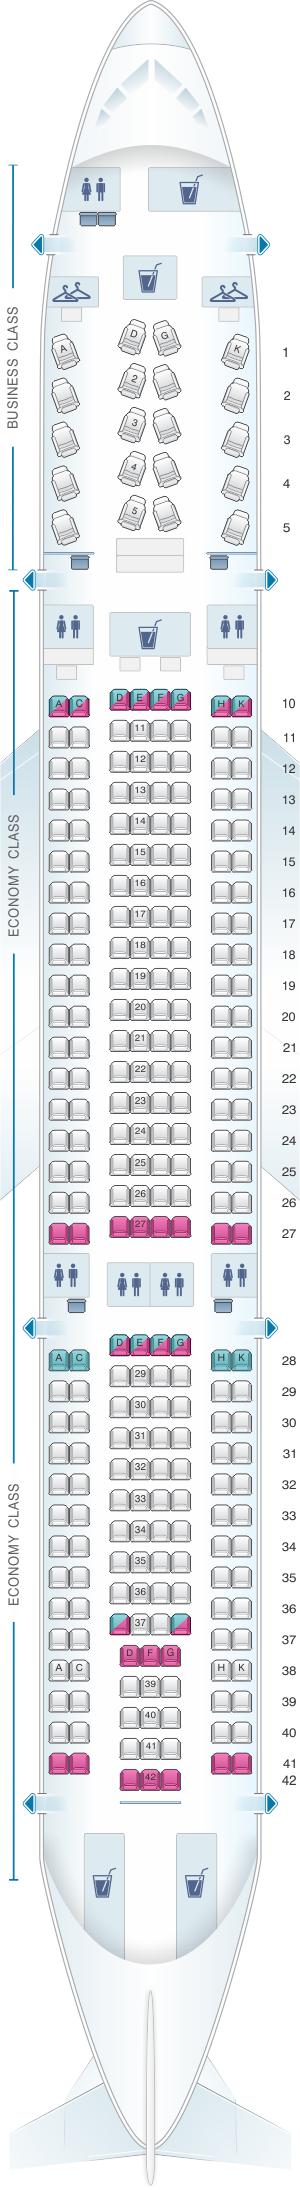 Seat Map Virgin Australia Airbus A330 200 Air transat